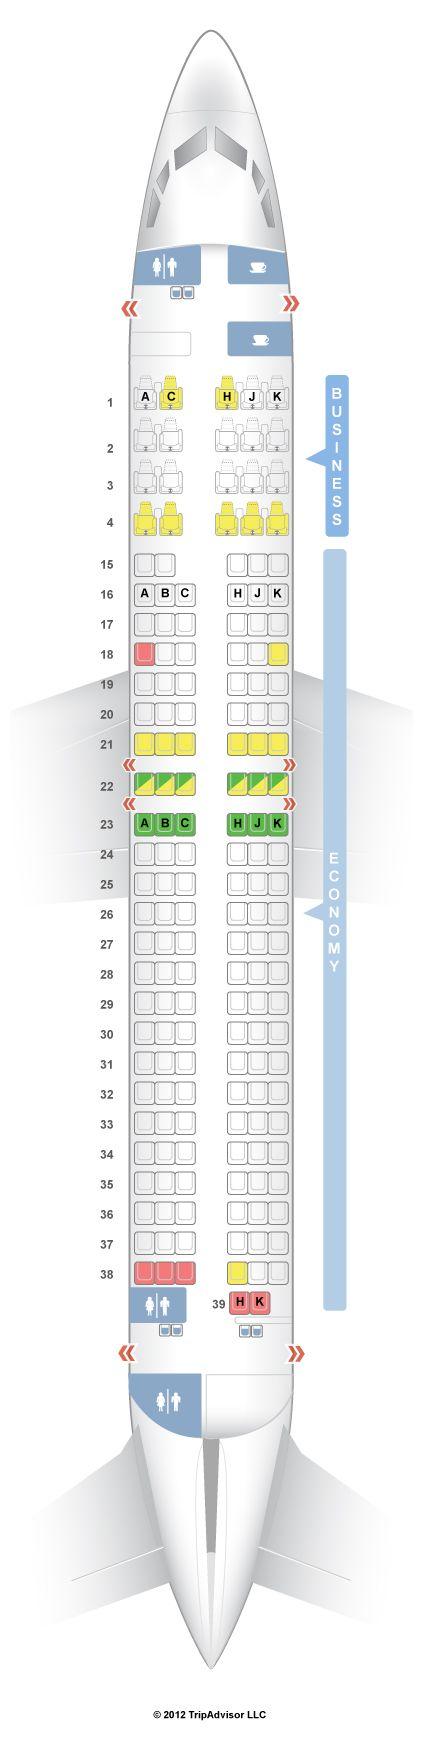 SeatGuru Seat Map Japan Airlines Boeing 737-800 (738) Domestic - SeatGuru